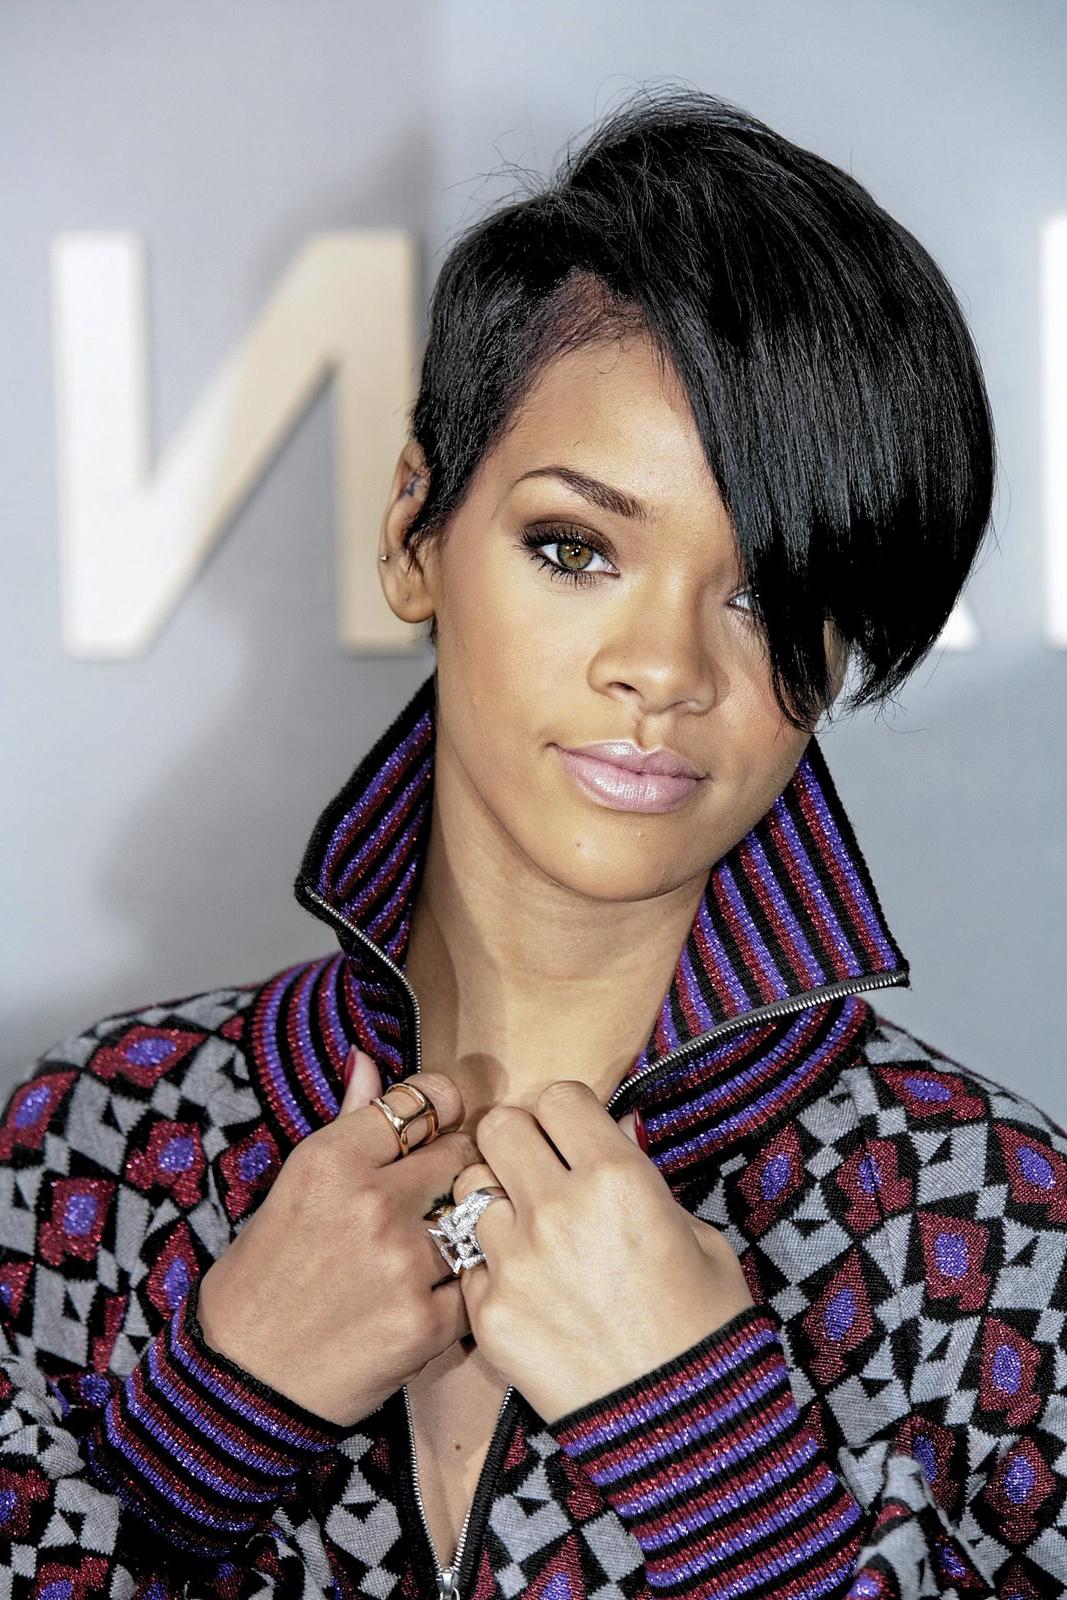 Medium Hairstyles,medium Hair Styles,medium Hairstyles: Short Regarding Famous Layered Medium Haircuts For Black Women (View 11 of 20)